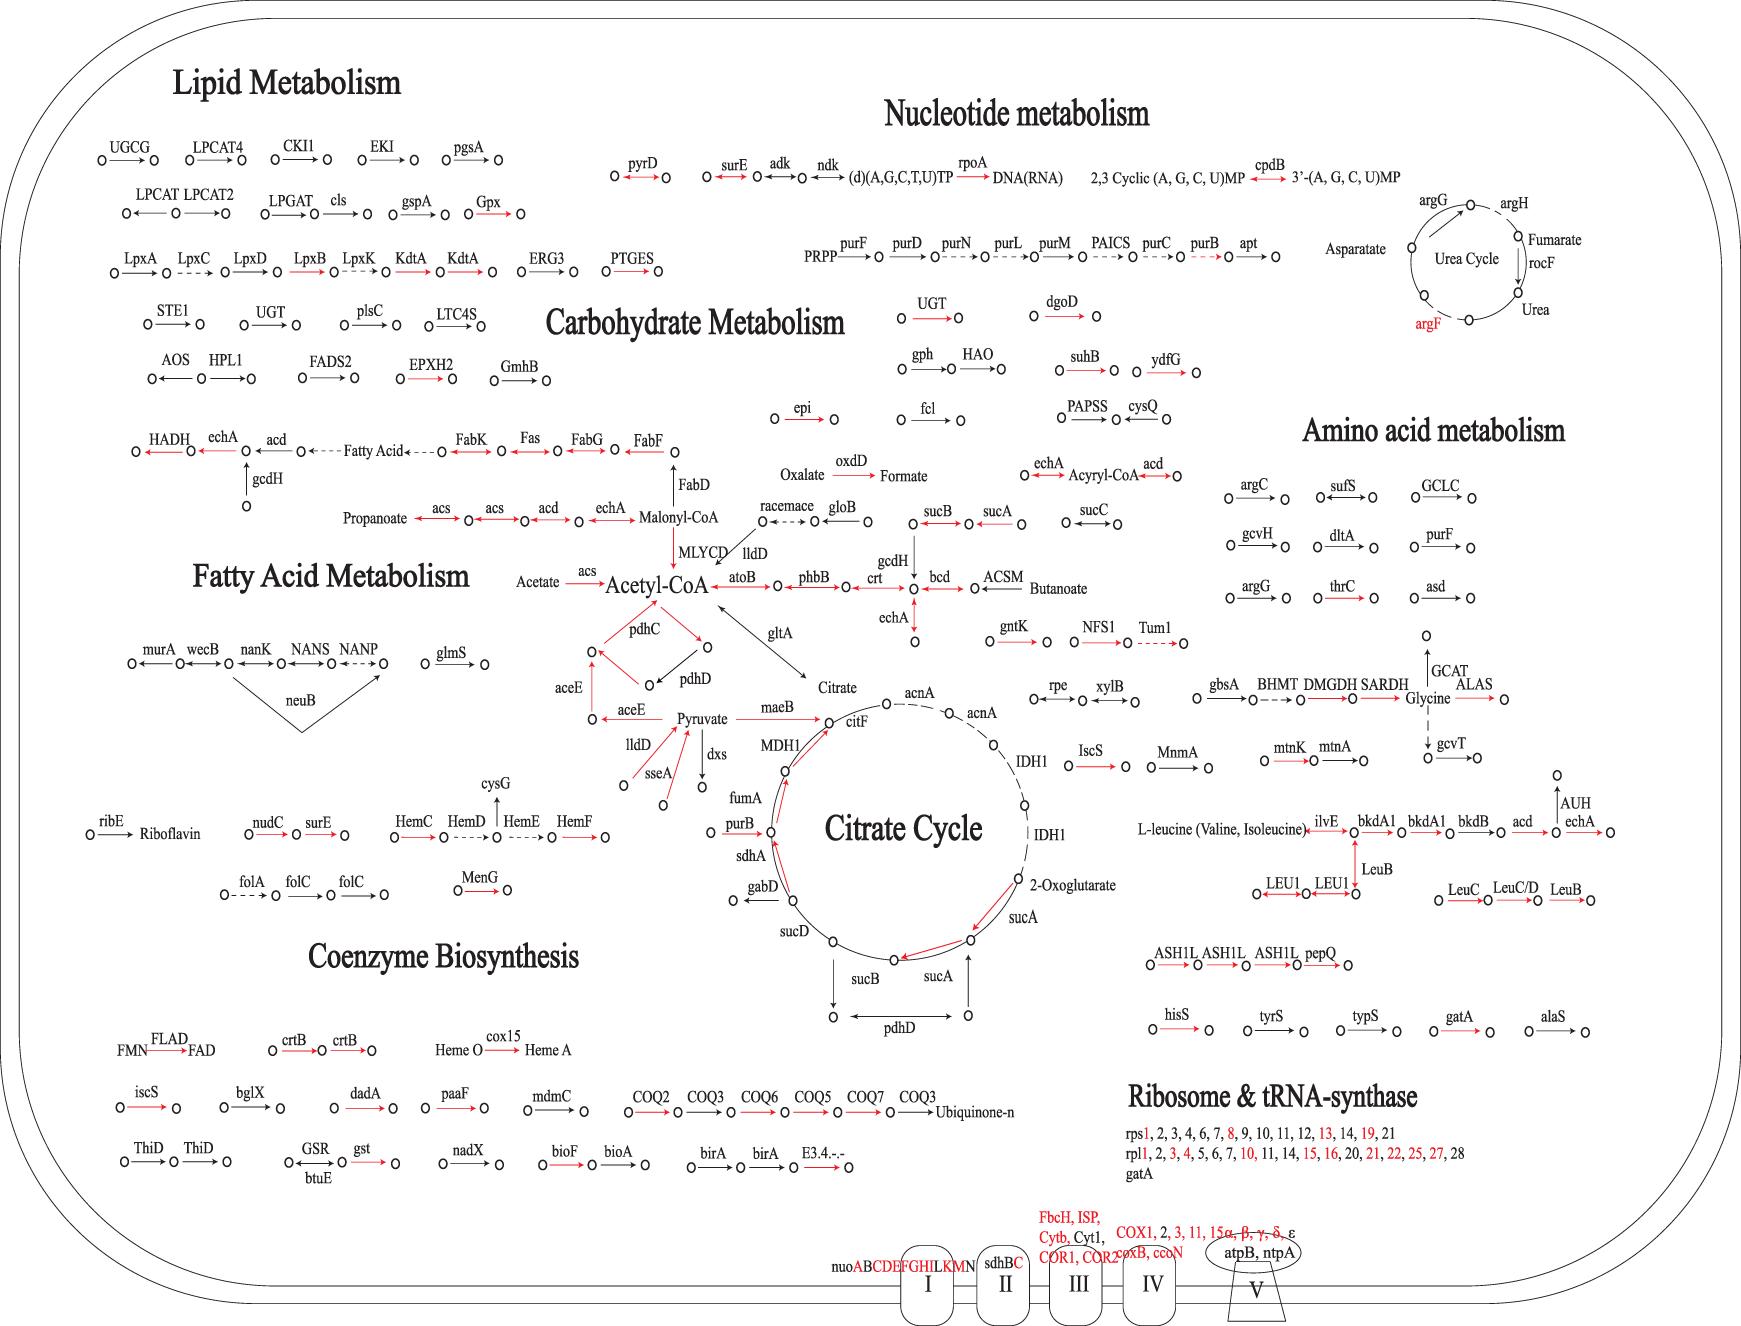 метаболизм митохондрий